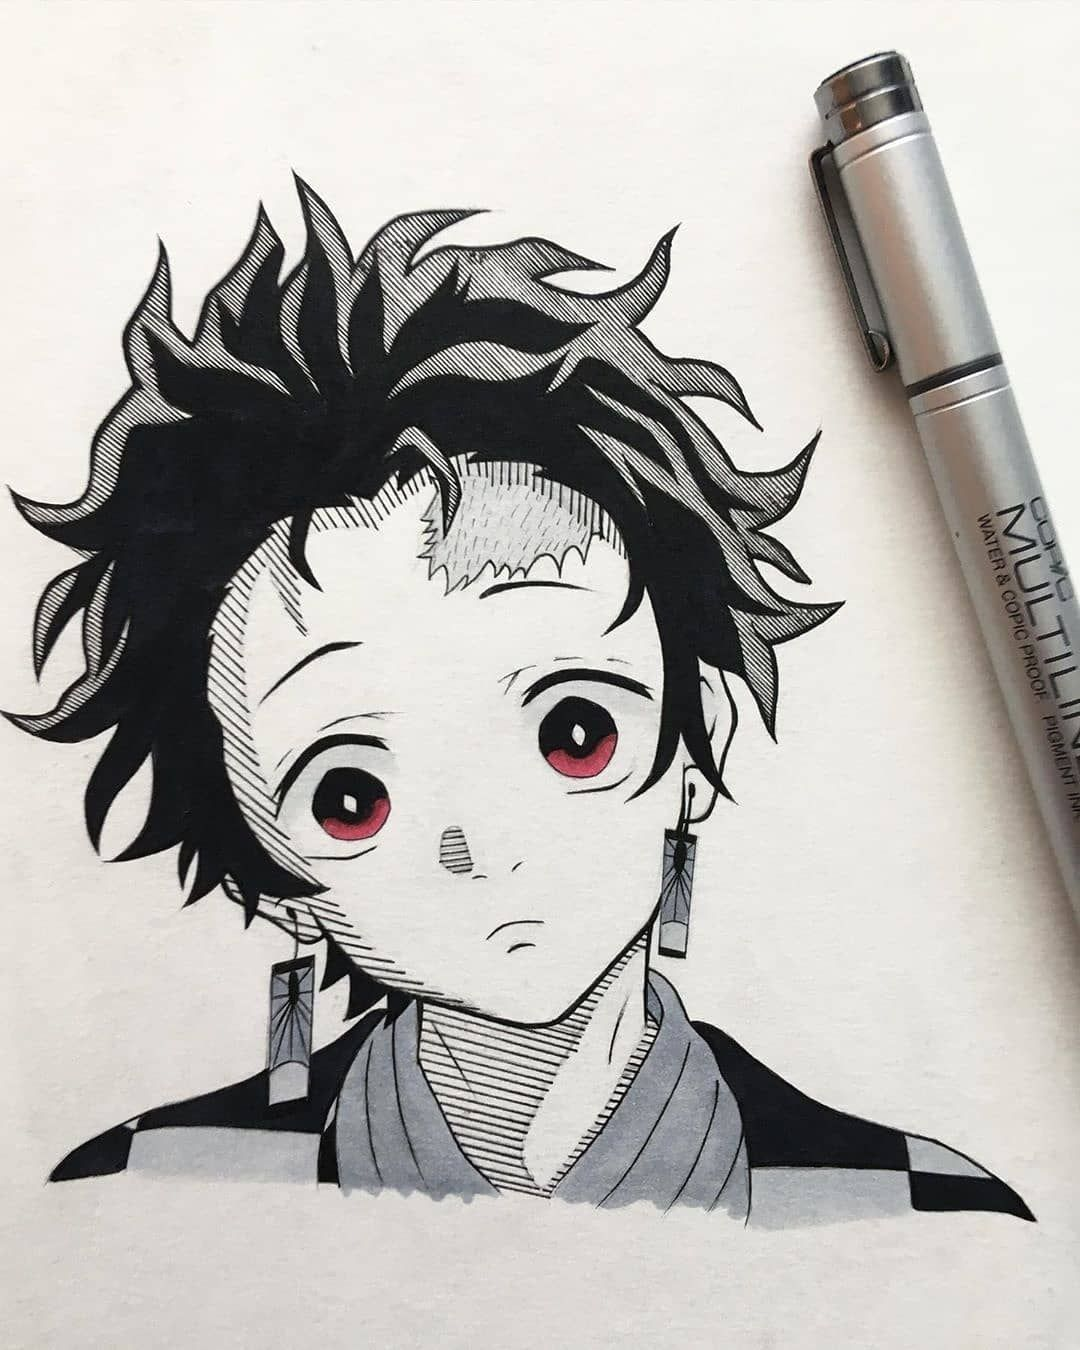 Art Illustration Artist Draw Digitalart Painting Manga Fanart Creative Pen Lineart Lineartillustration Anime Art Anime Fanart Drawings